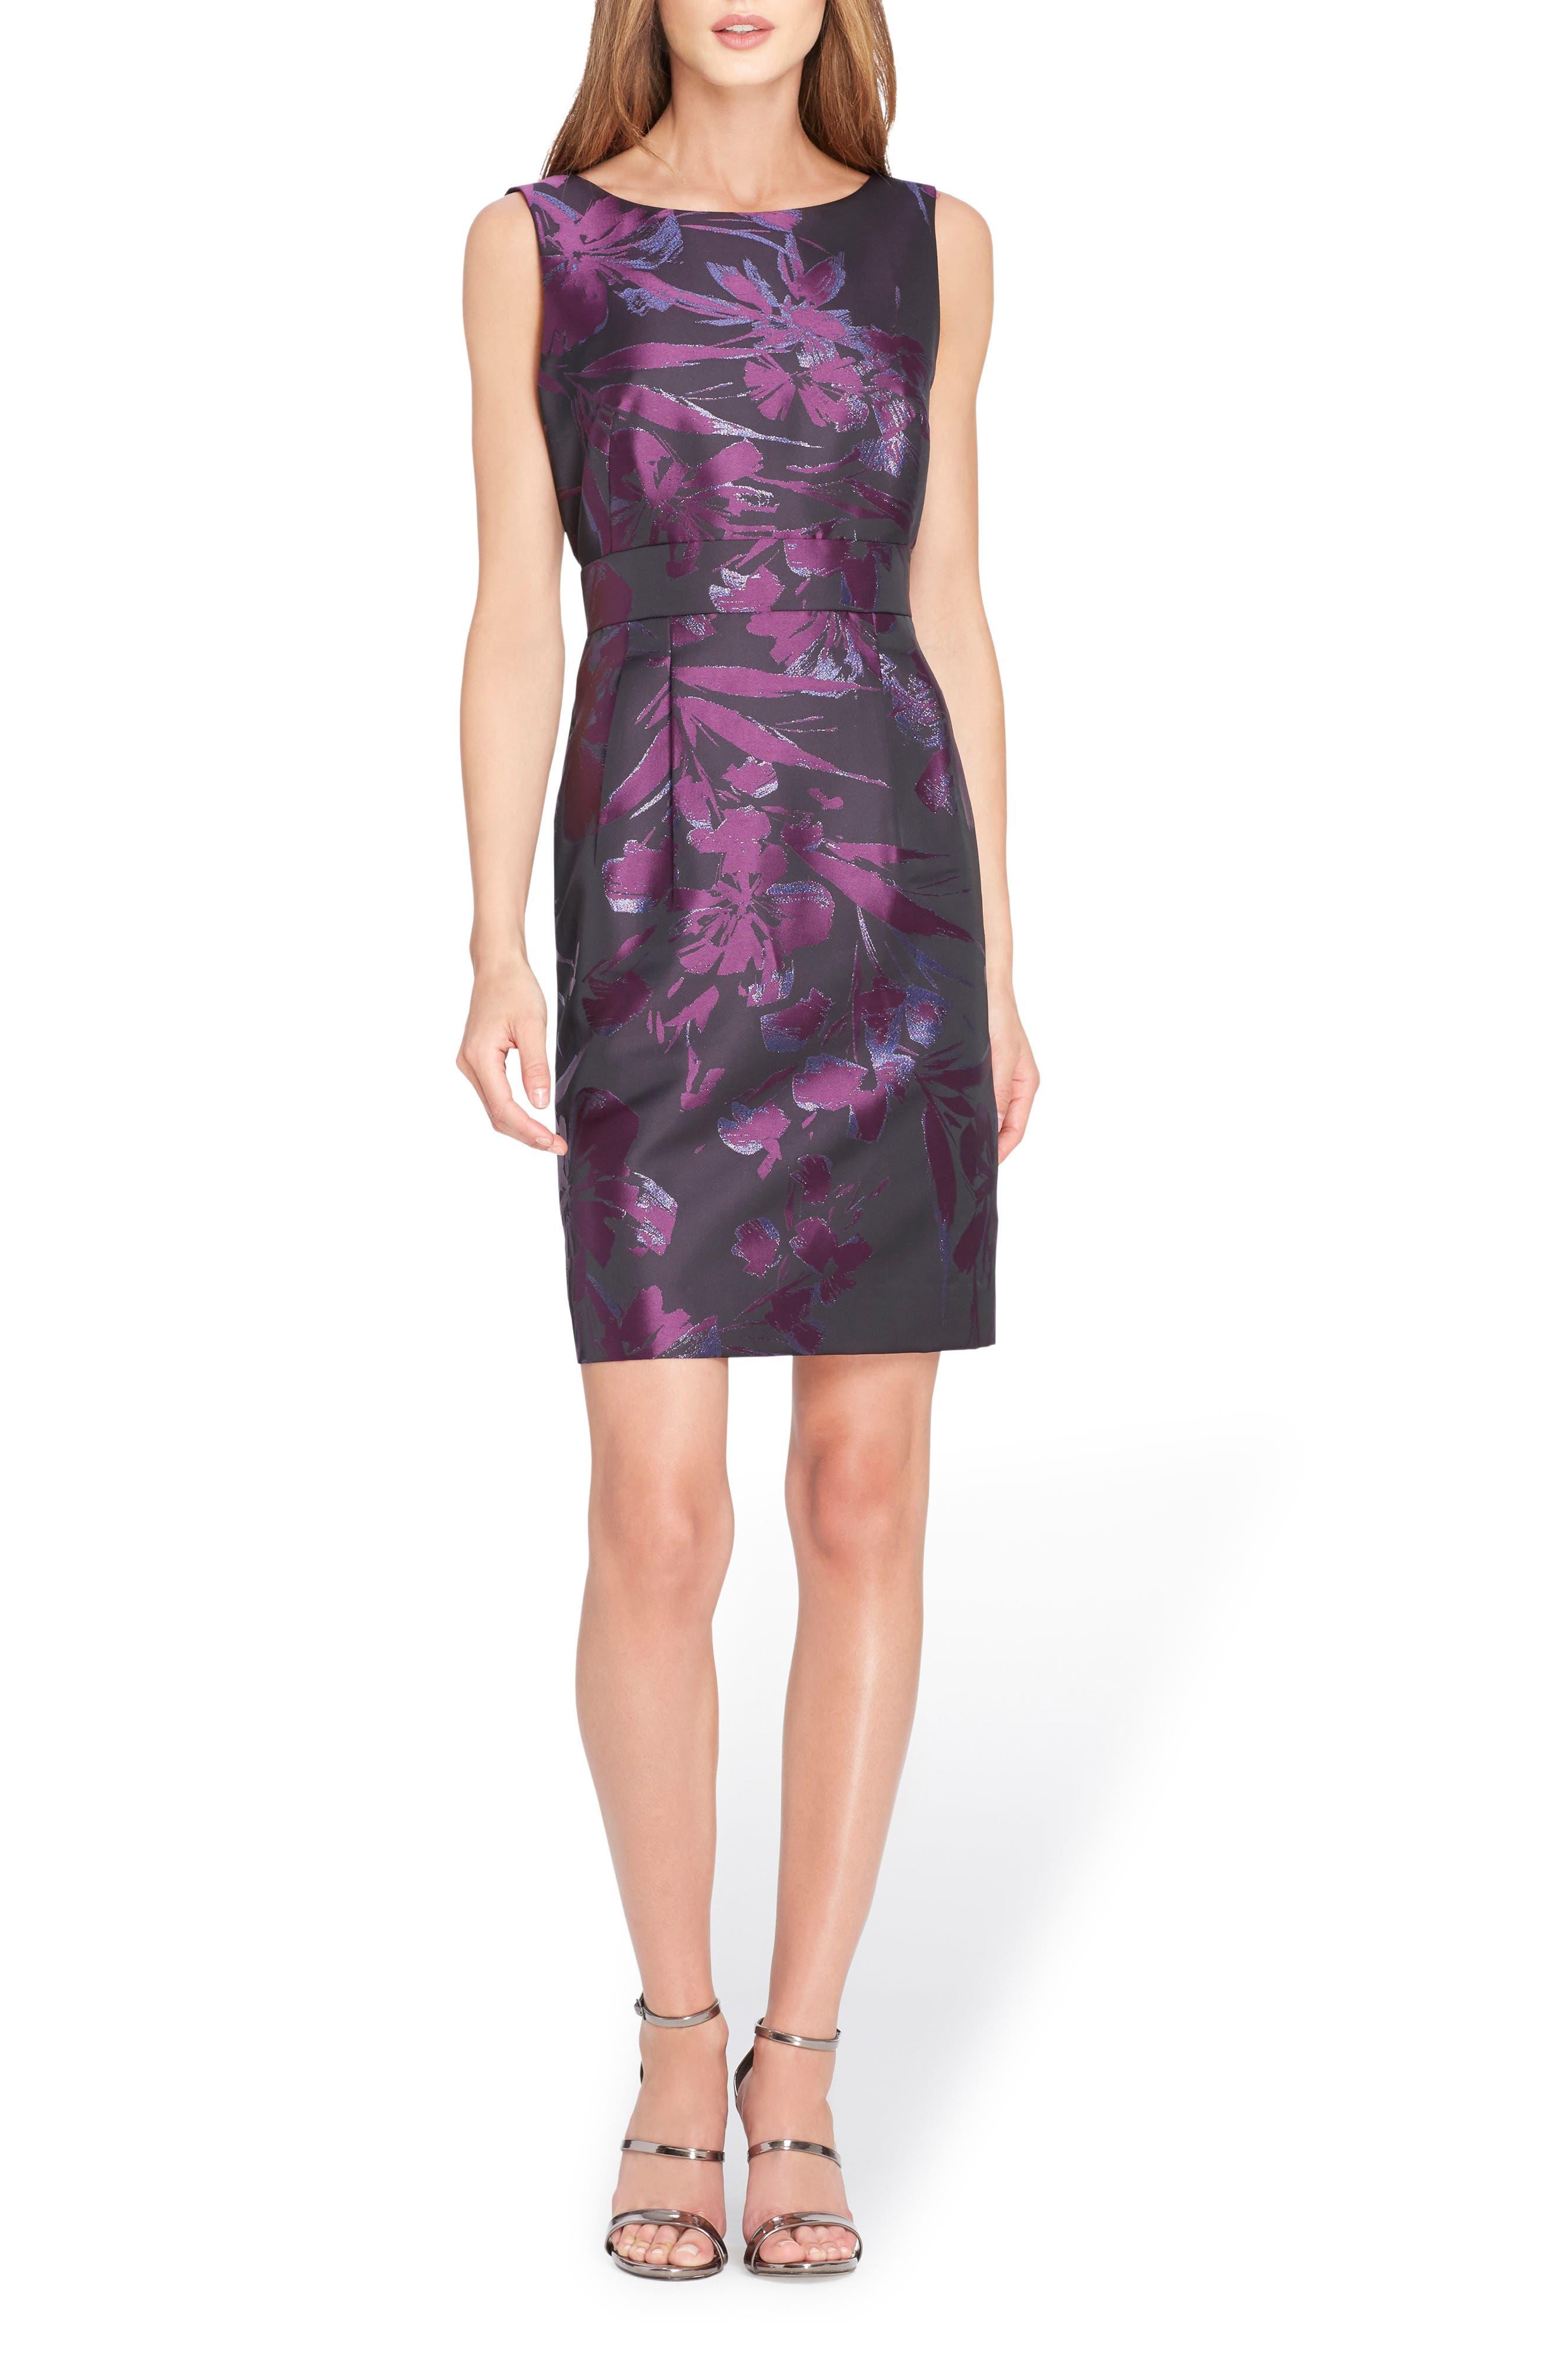 Alternate Image 1 Selected - Tahari Metallic Jacquard Sheath Dress (Regular & Petite)